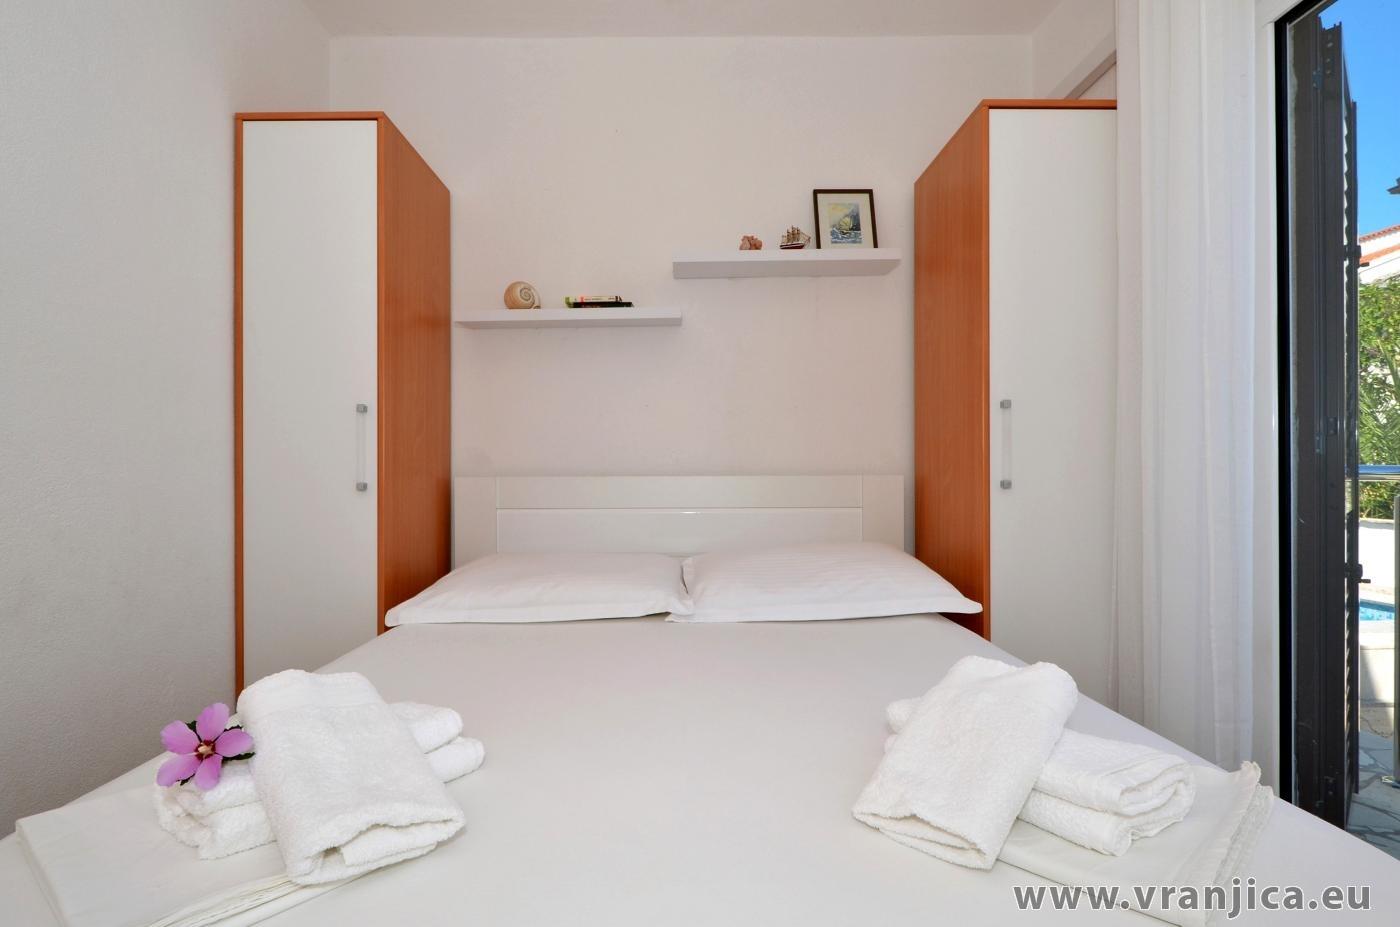 https://www.vranjica.eu/pokoje/apartman-inge-ap2-4-1-1572992470L.jpg